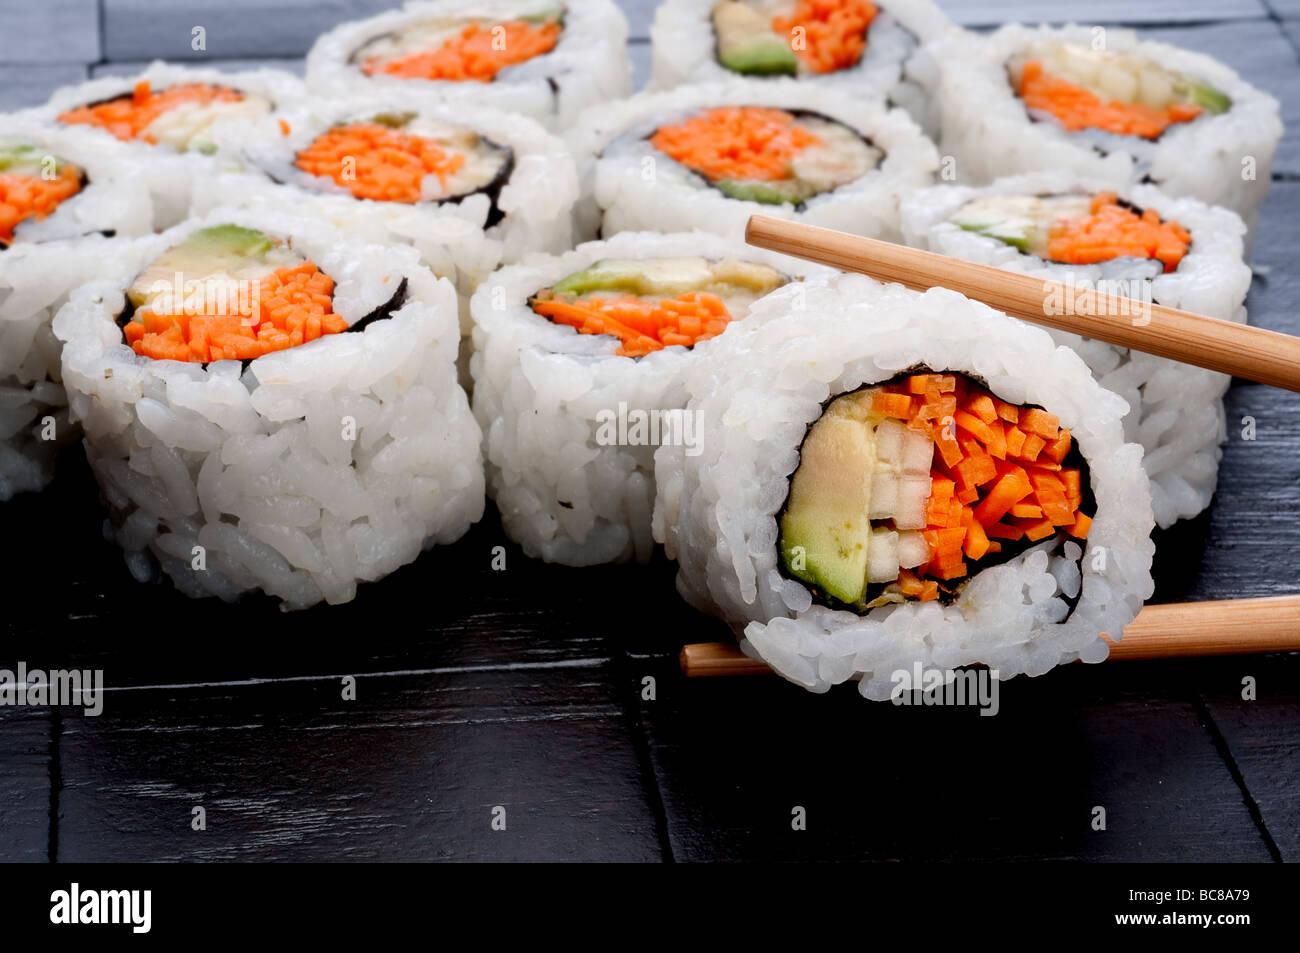 Celebración palillos sushi enfrente de sushi más negro sobre un fondo de textura Imagen De Stock